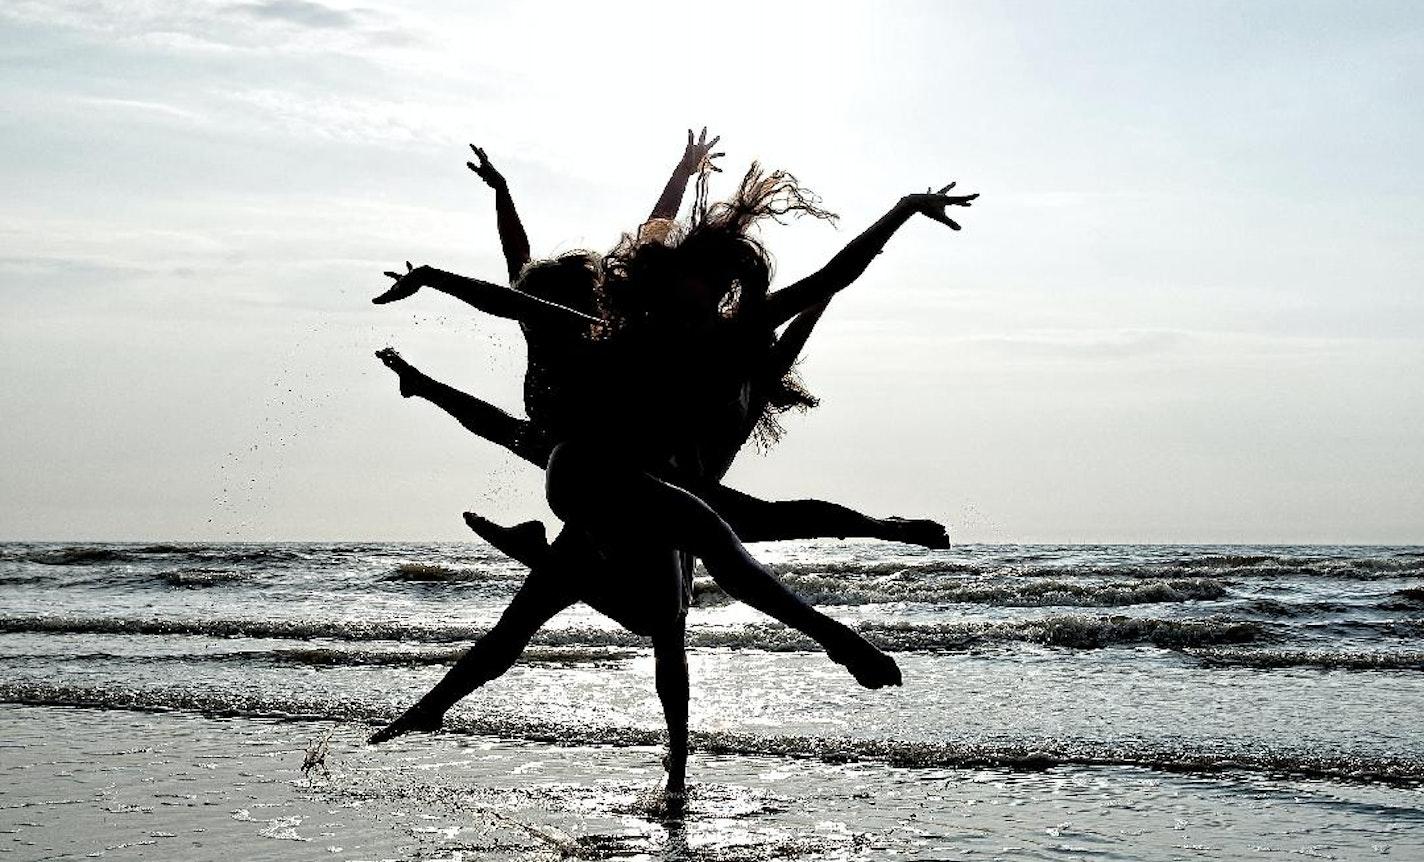 Creating Balance Through Dance and Ritual